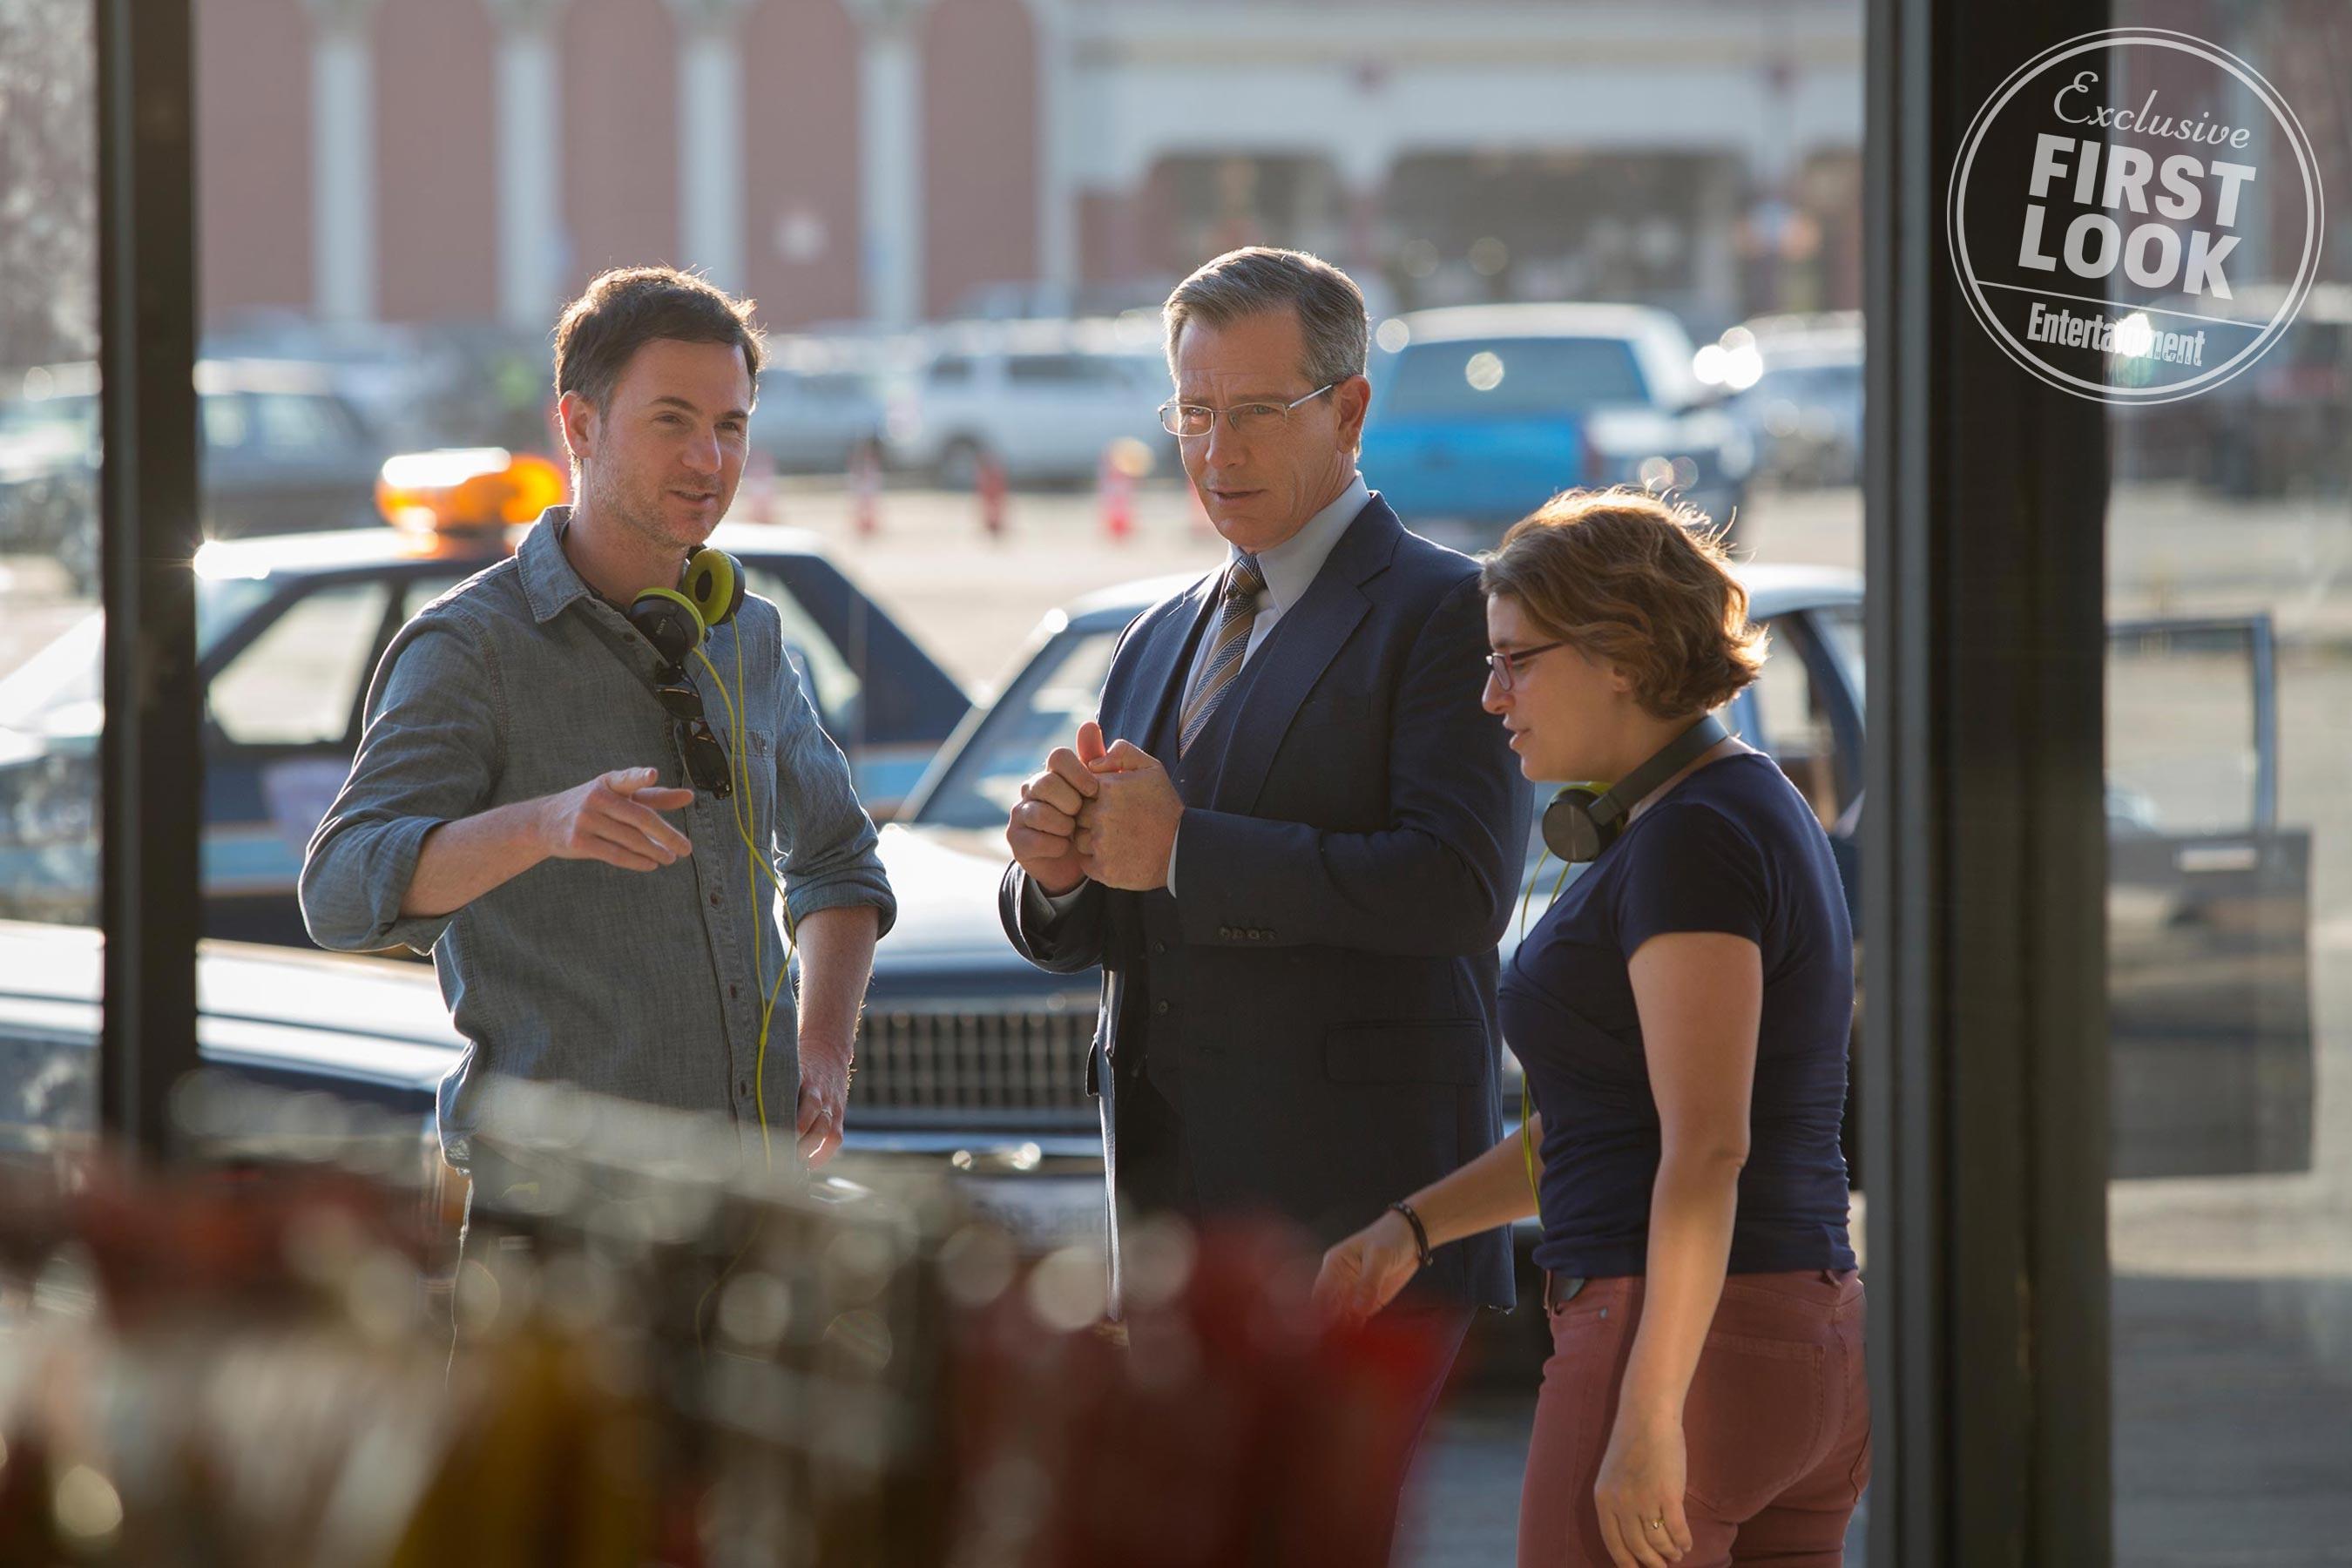 Ben Mendolsohn in Talos' human attire with directors Ryan Fleck and Anna Boden